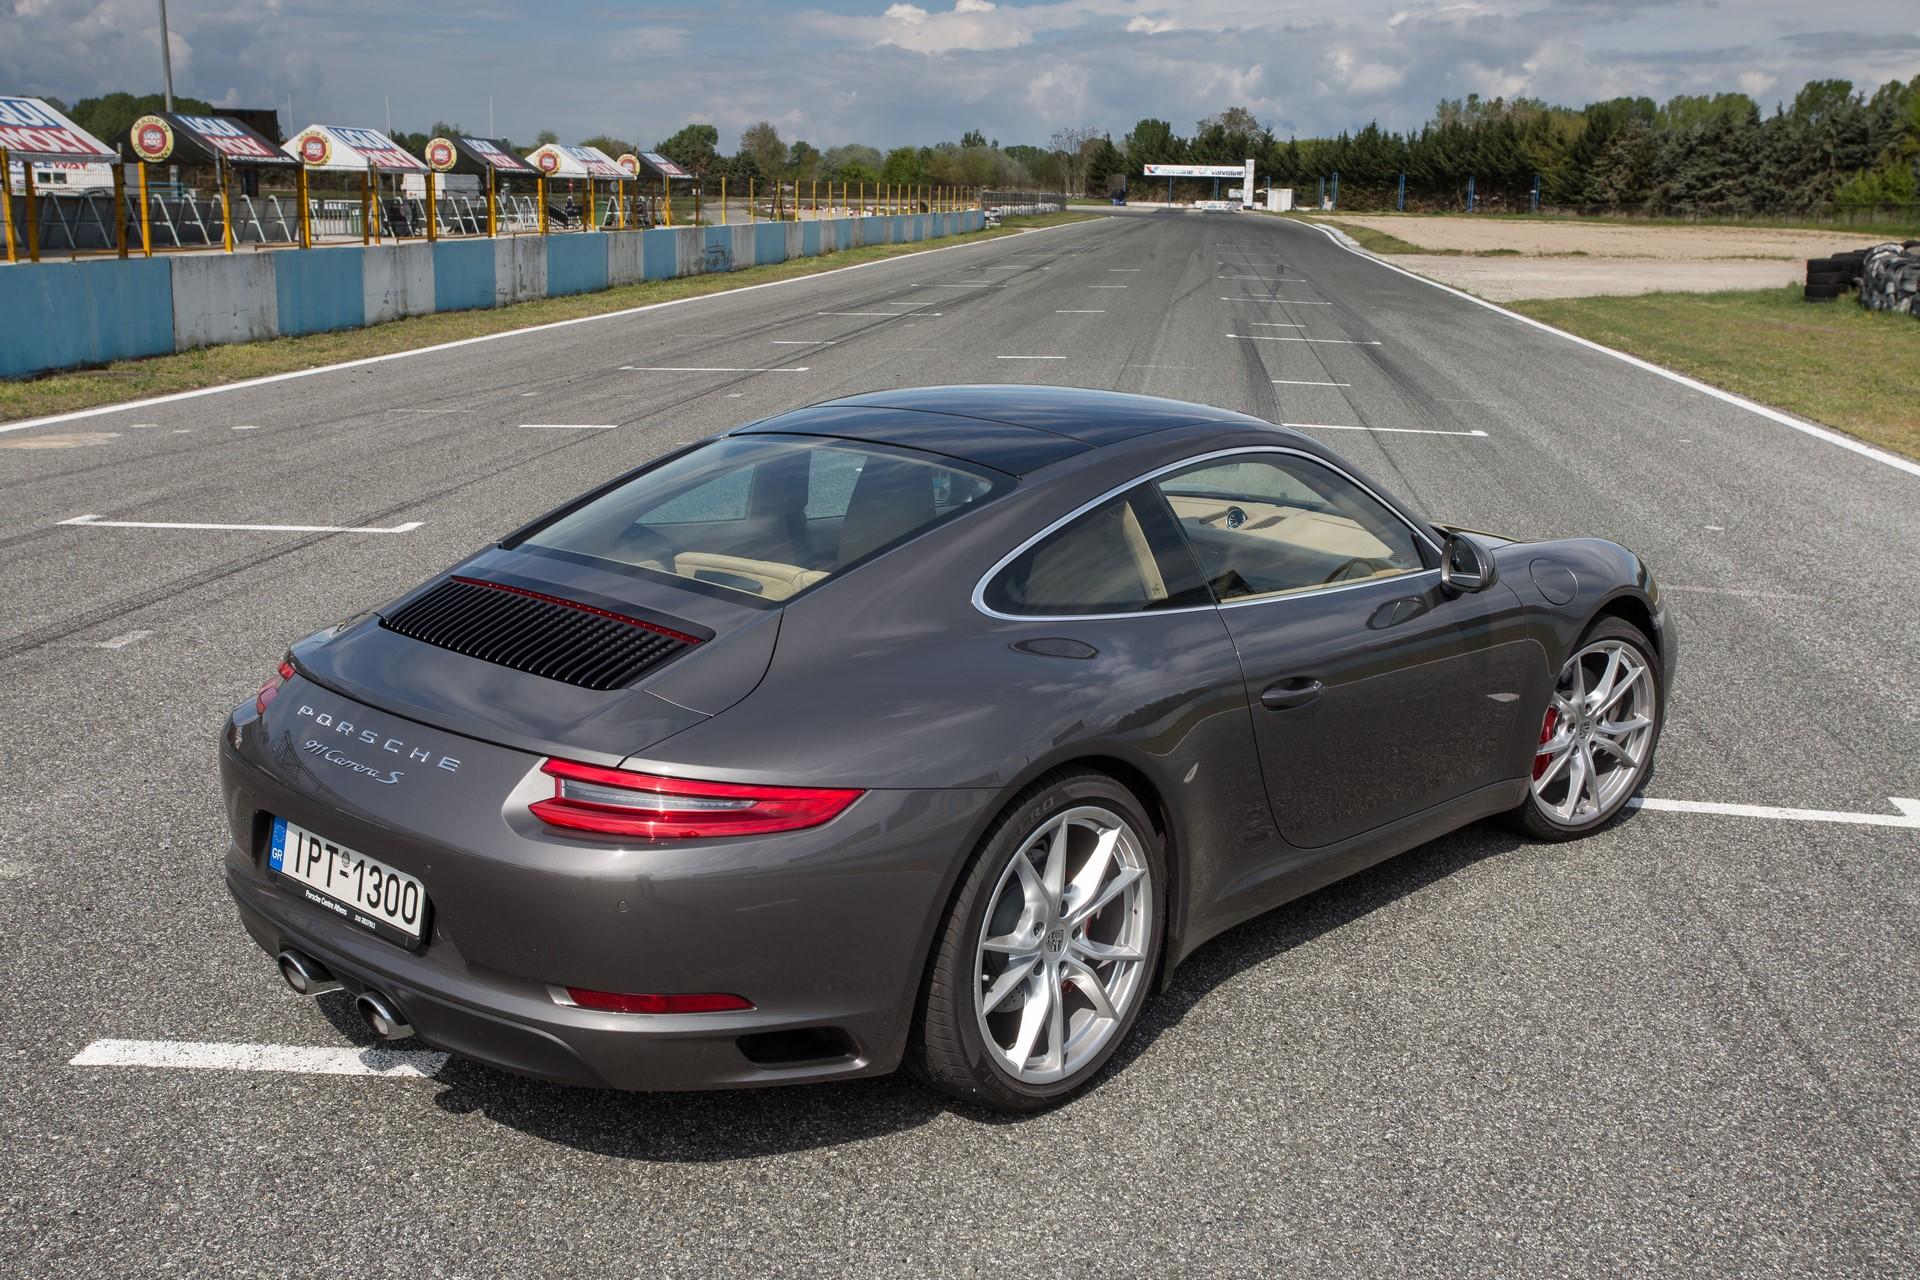 Porsche Driving Experience 2017 Serres (11)